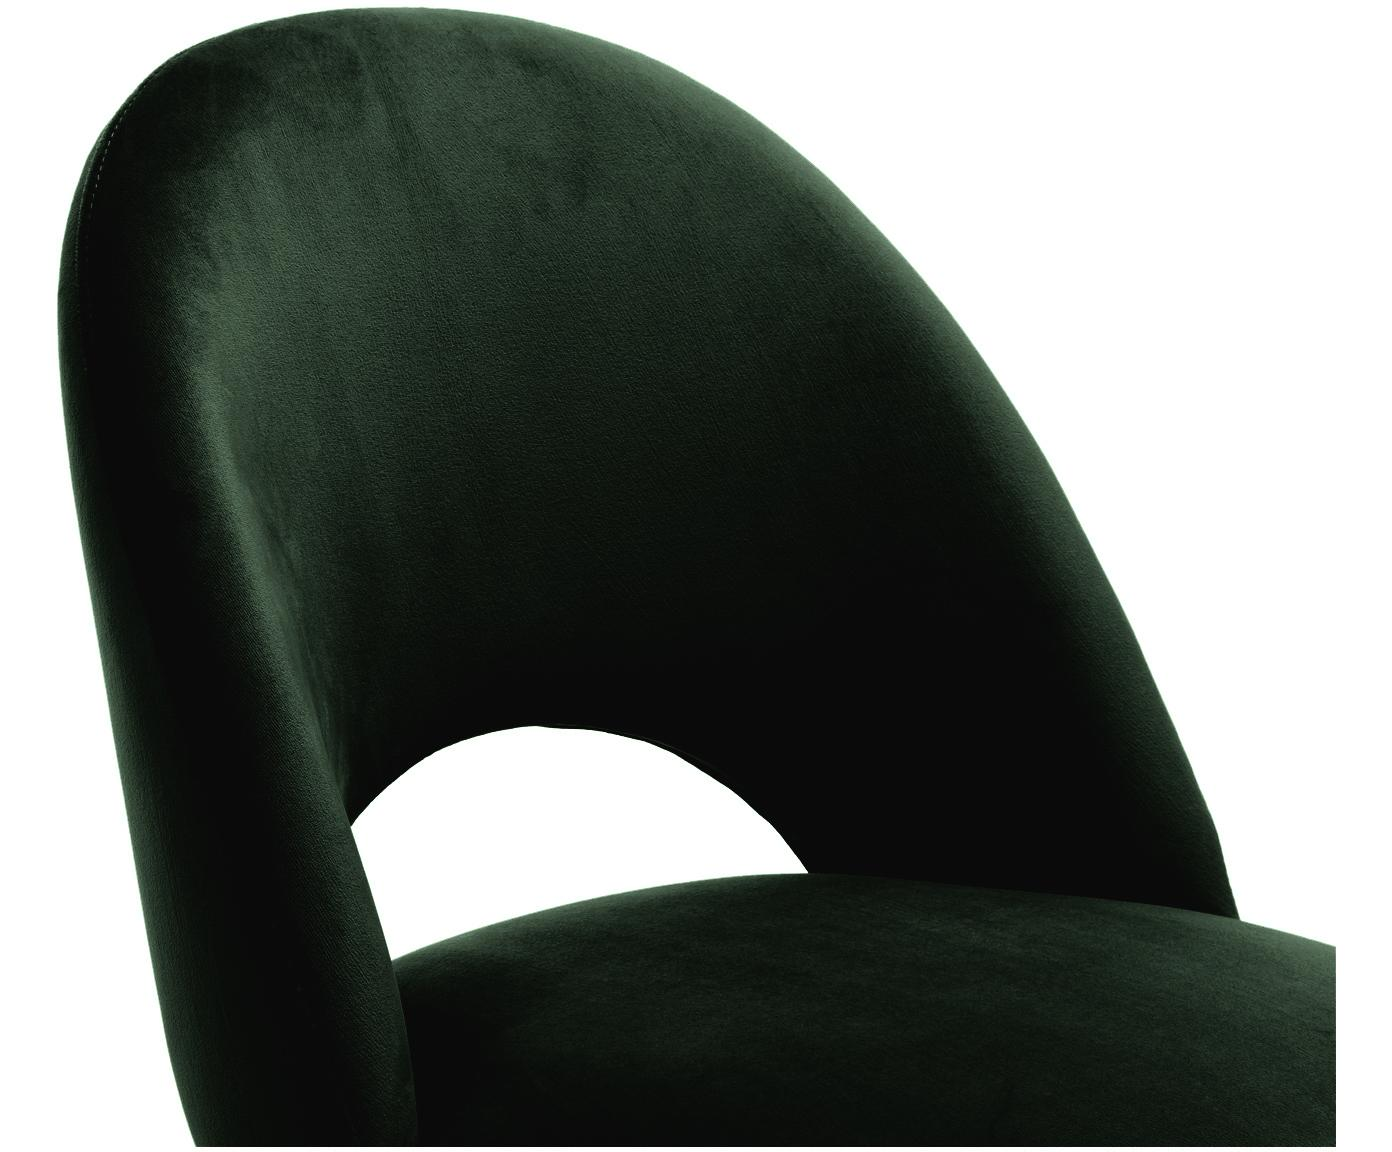 Samt-Barstuhl Rachel, Bezug: Samt (Polyester) 50.000 S, Beine: Metall, pulverbeschichtet, Samt Dunkelgrün, 48 x 110 cm